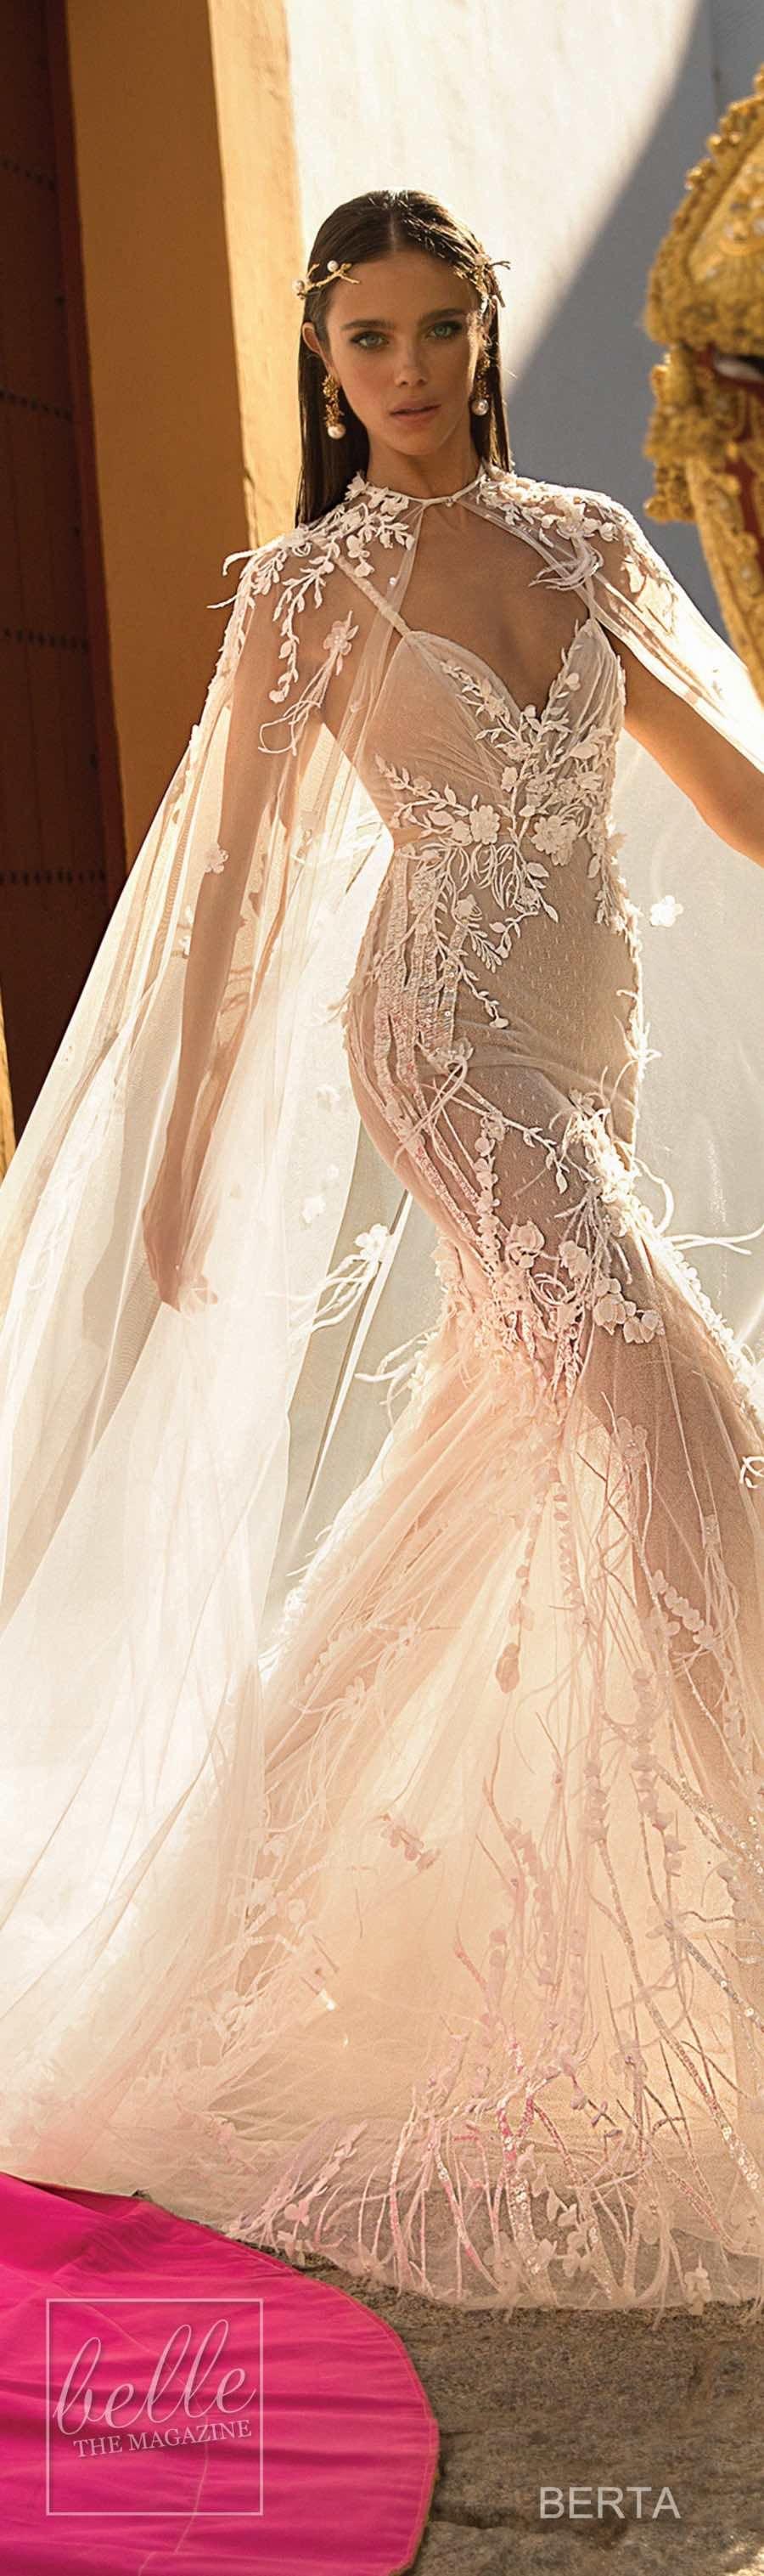 Berta fall seville wedding dress collection